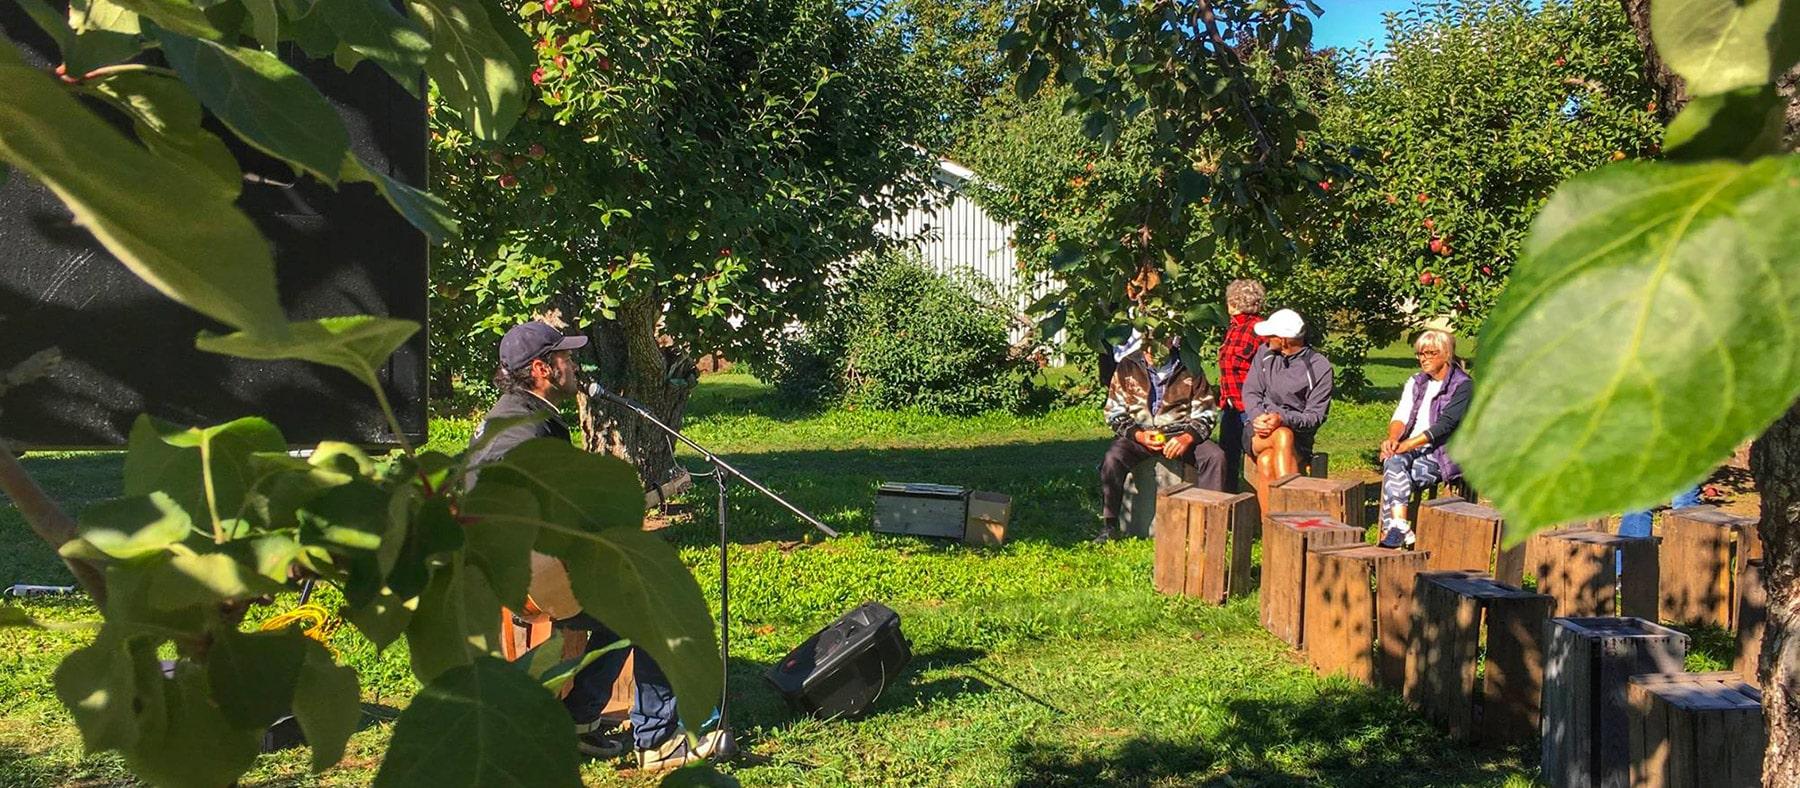 festival-folklore-automne-quebec-le-mag